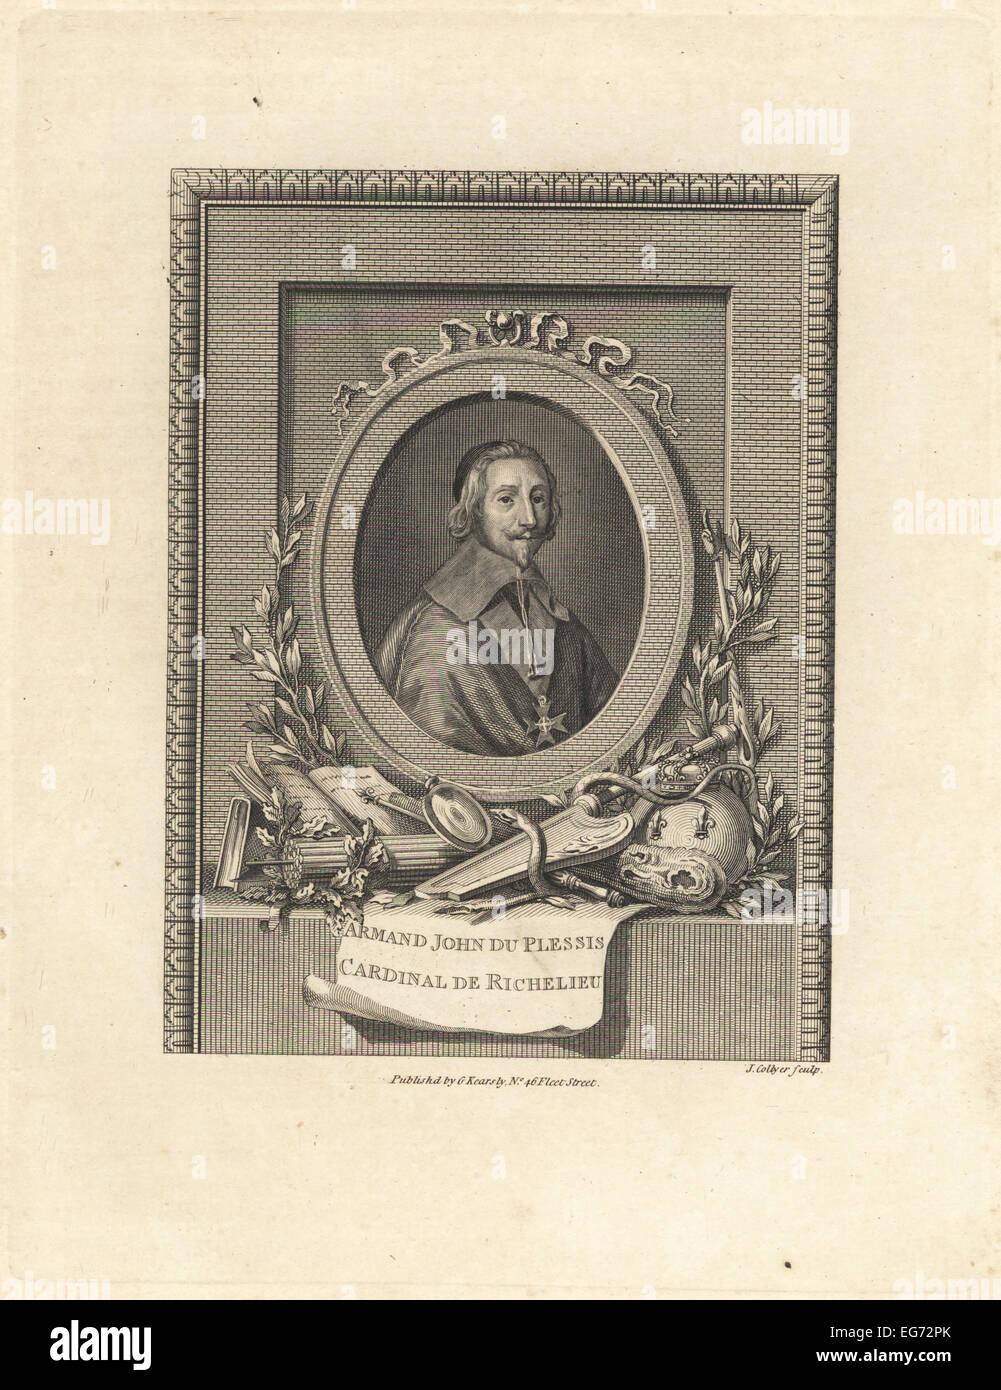 Cardinal de Richelieu, Armand Jean du Plessis, French clergyman, noble and statesman. - Stock Image